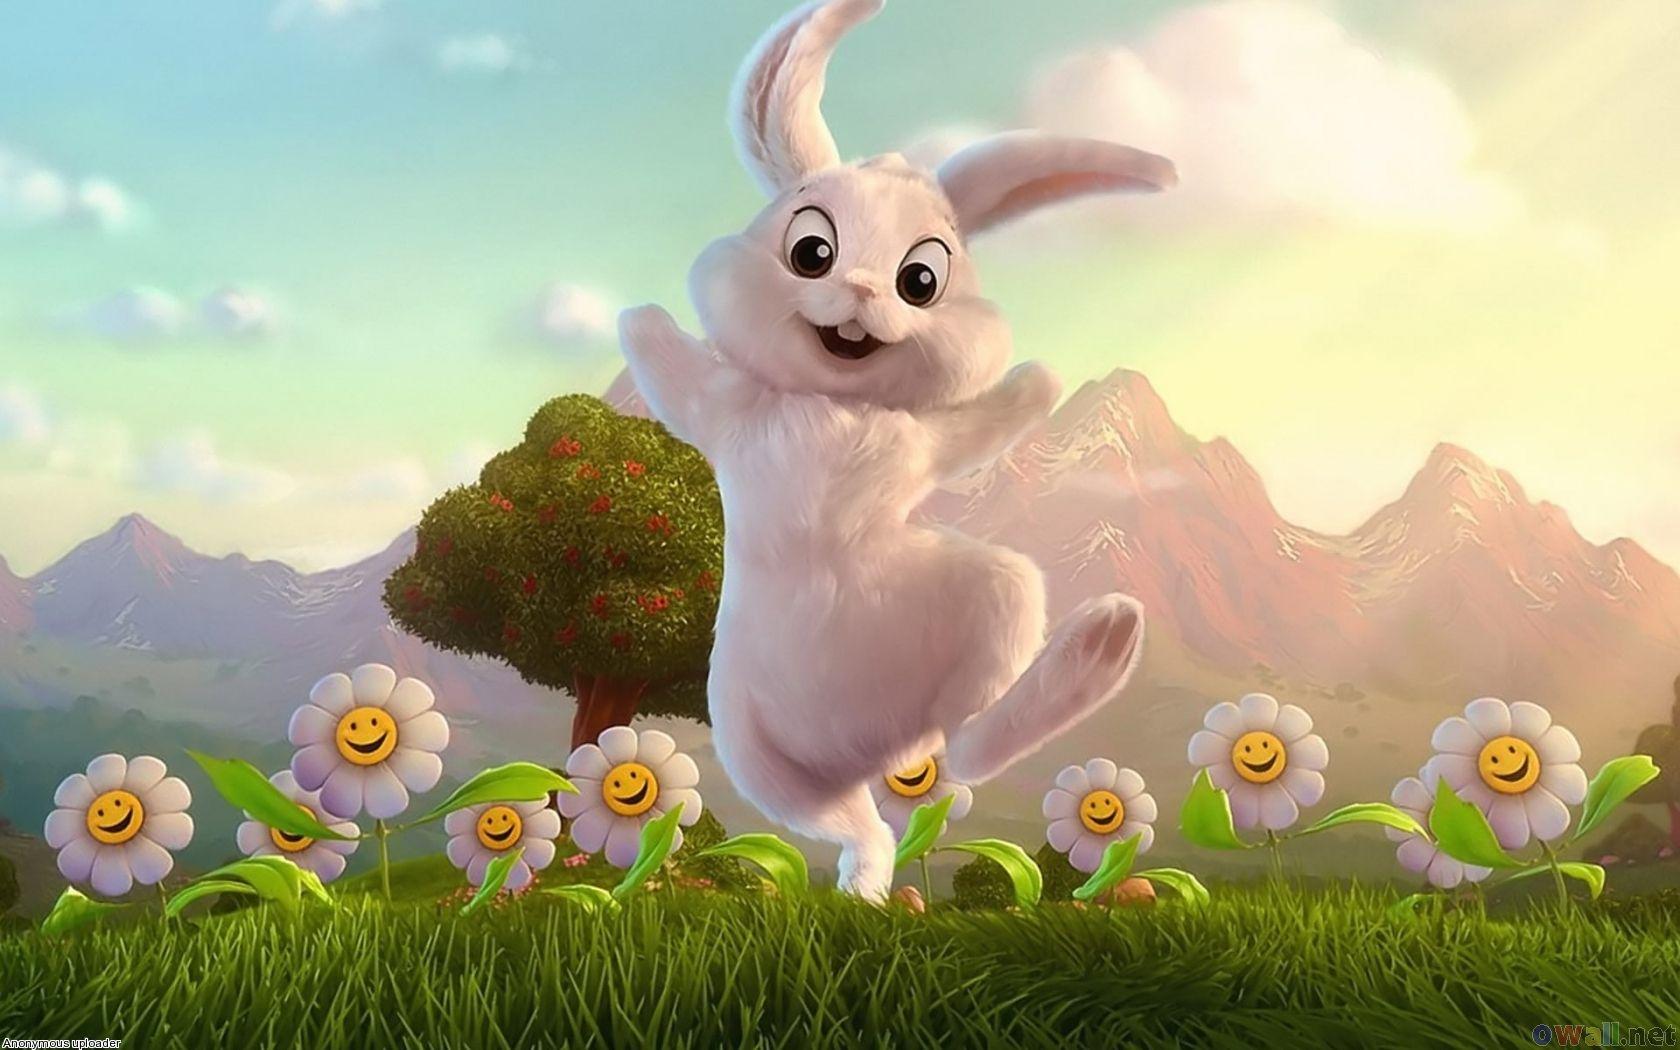 cute bunny rabbits wallpaper desktop best quality hd wallpapers